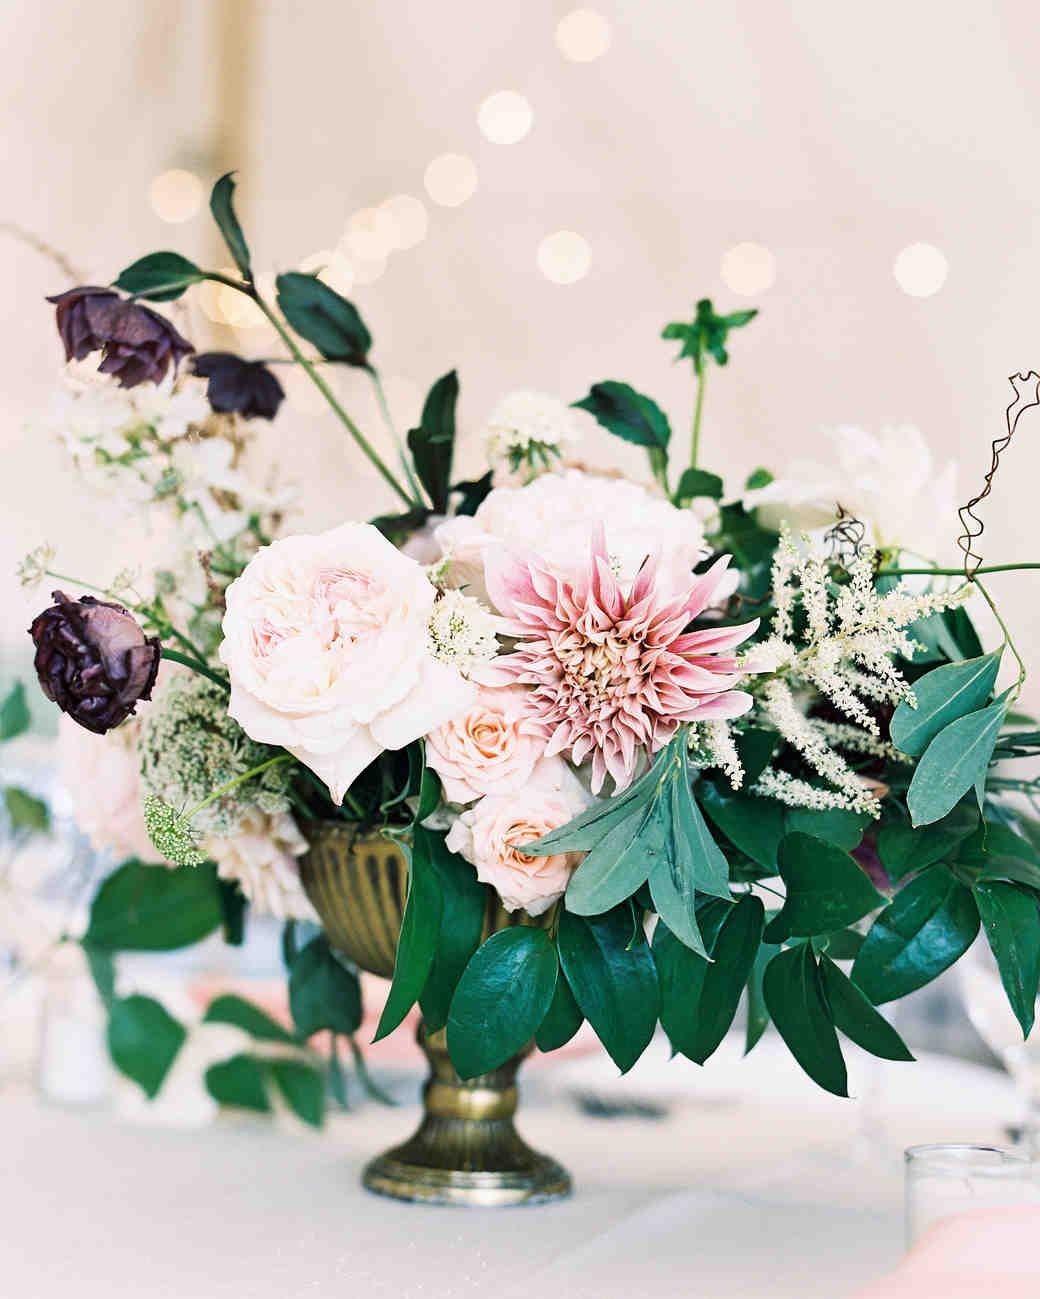 Pink and maroon wedding decor   Pink Wedding Centerpieces We Love  Weddings  Centerpieces